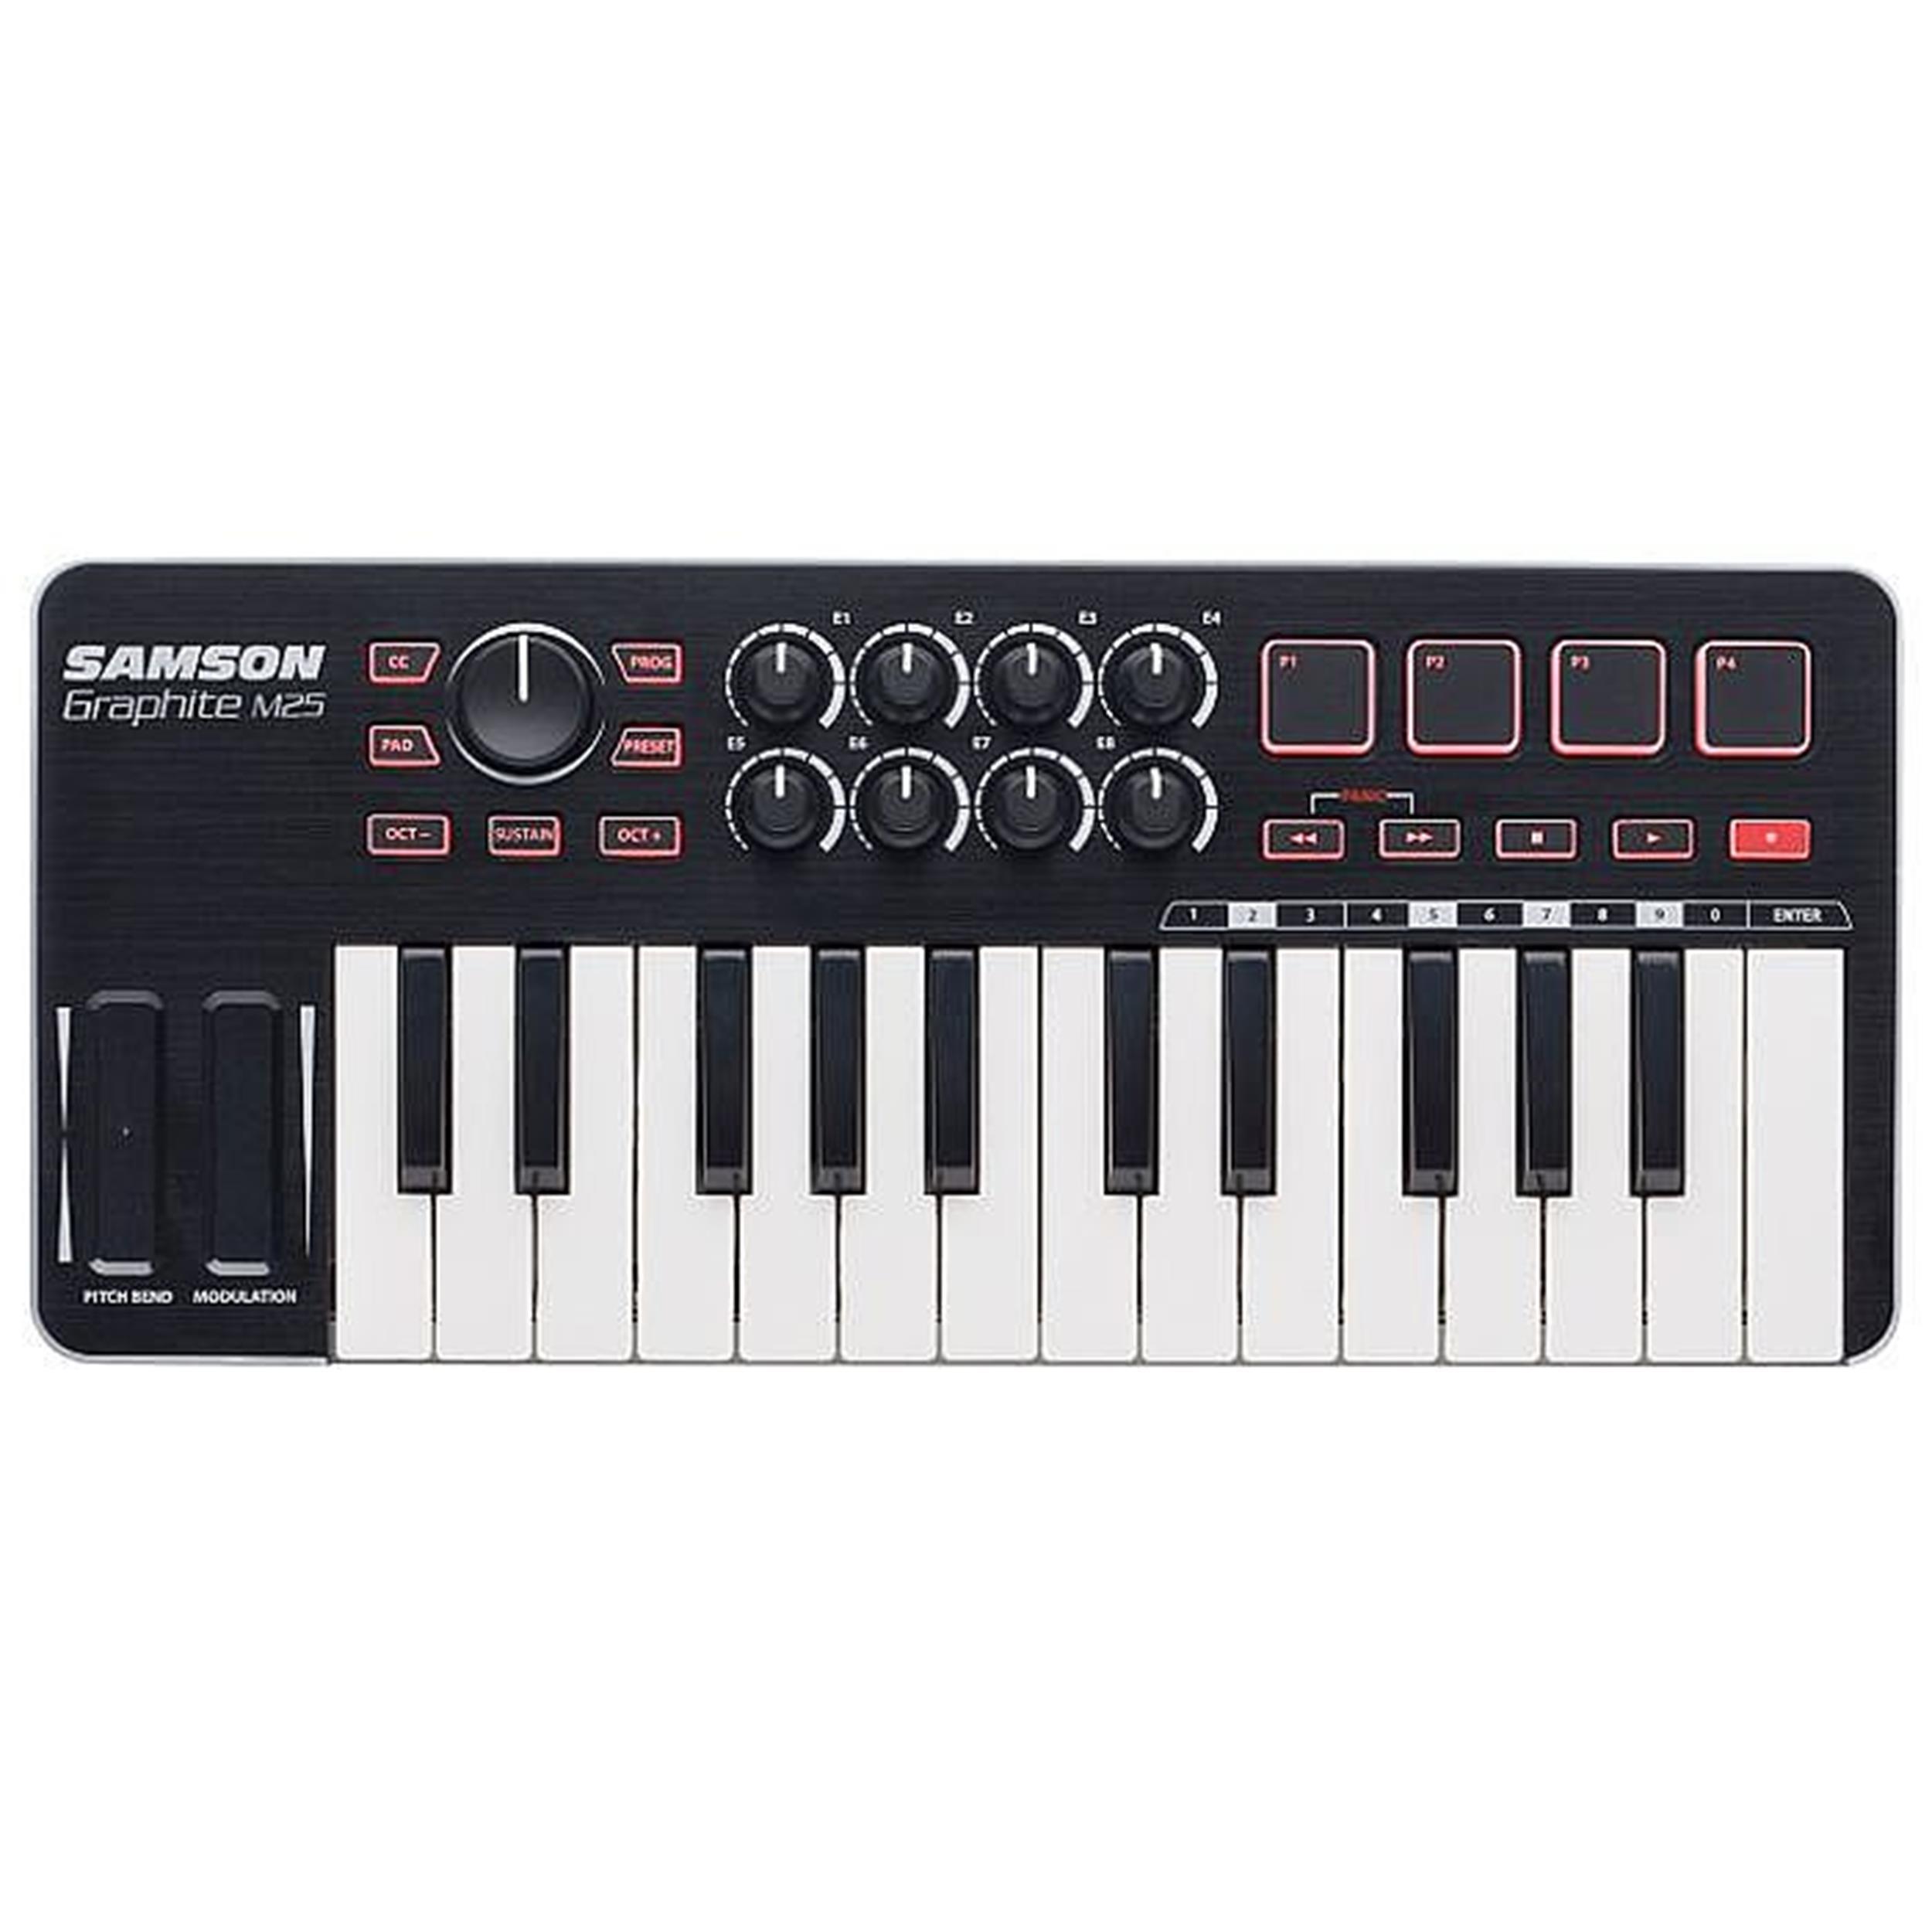 Samson GRAPHITE M25 - Mini MIDI Controller USB